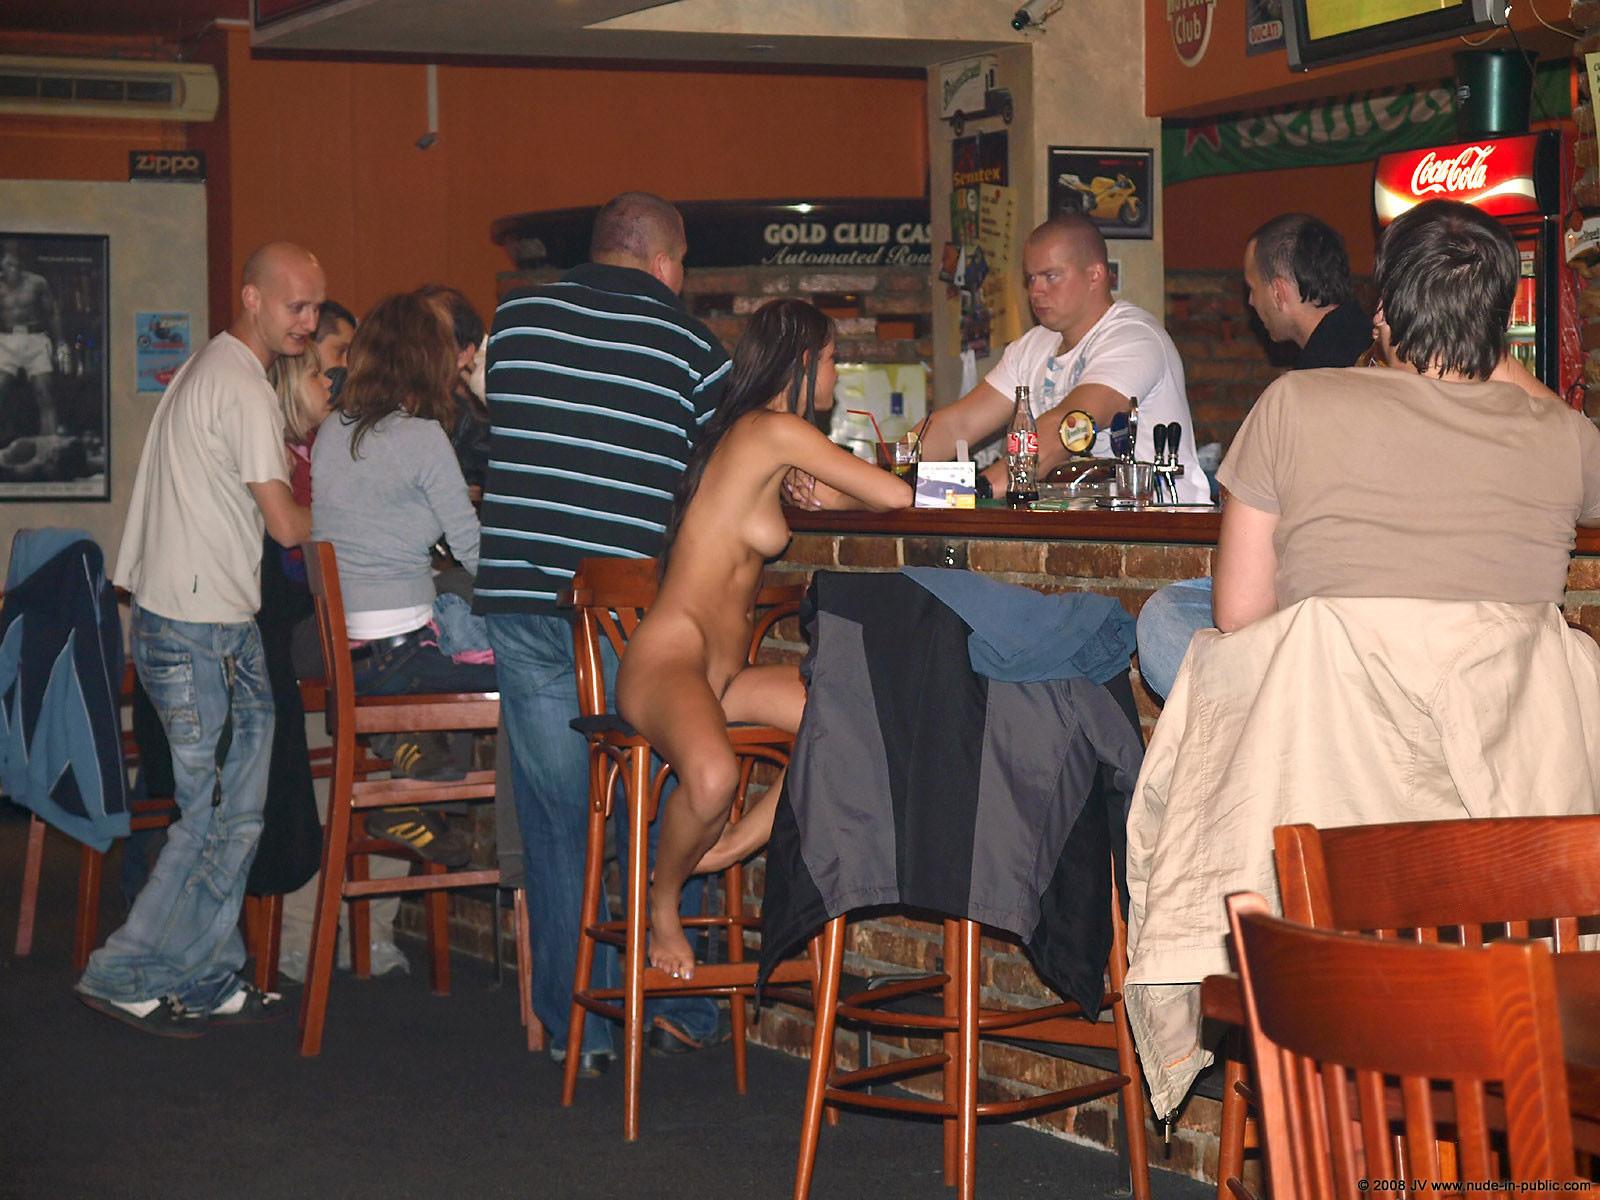 melisa-pub-beer-bar-girl-nude-in-public-98